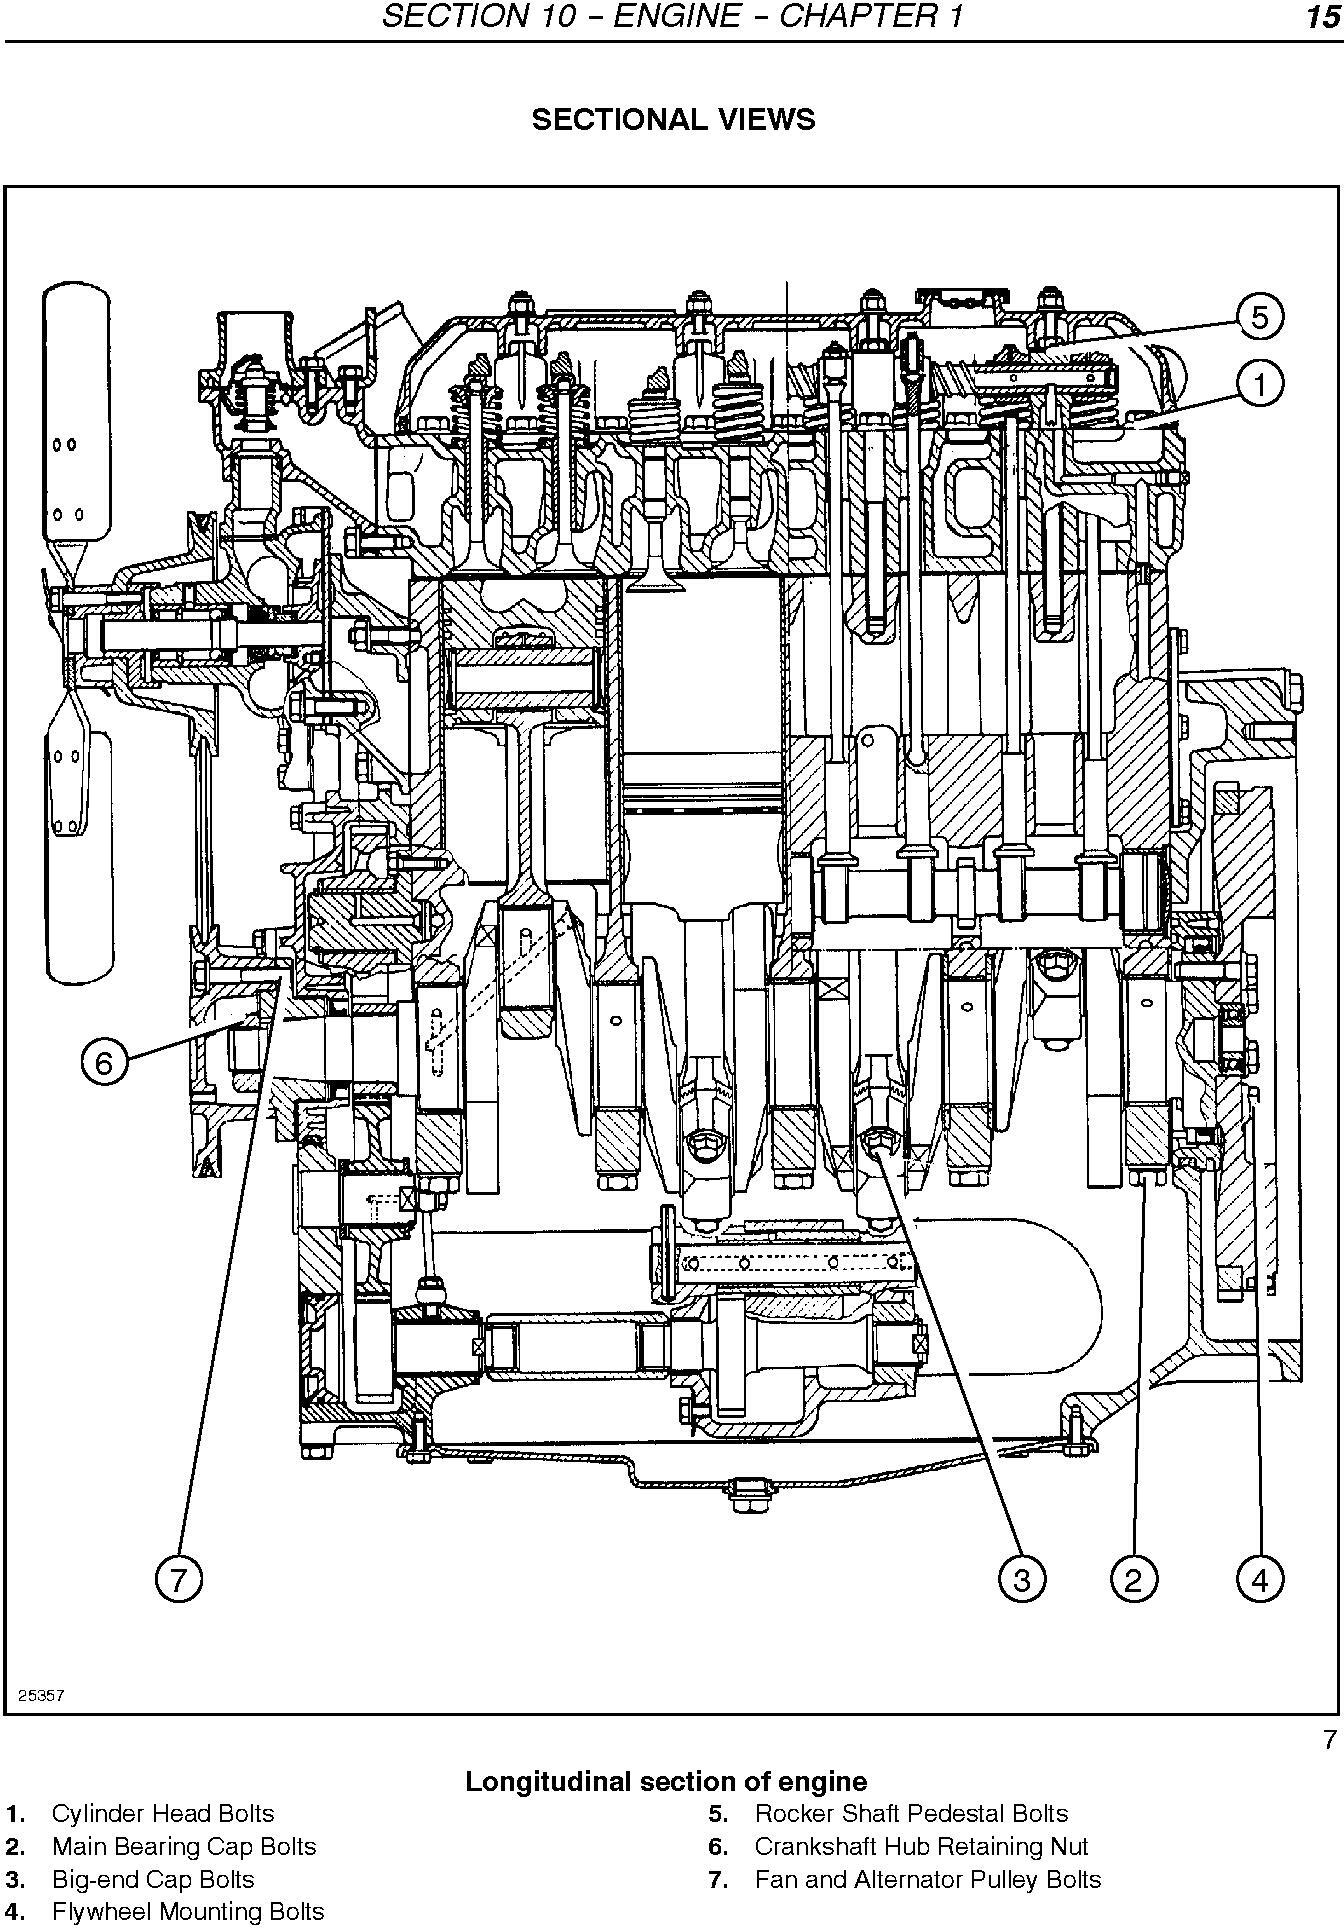 New Holland TD75D TD95D TD95D High Clearance Tractors Complete Service Manual - 1